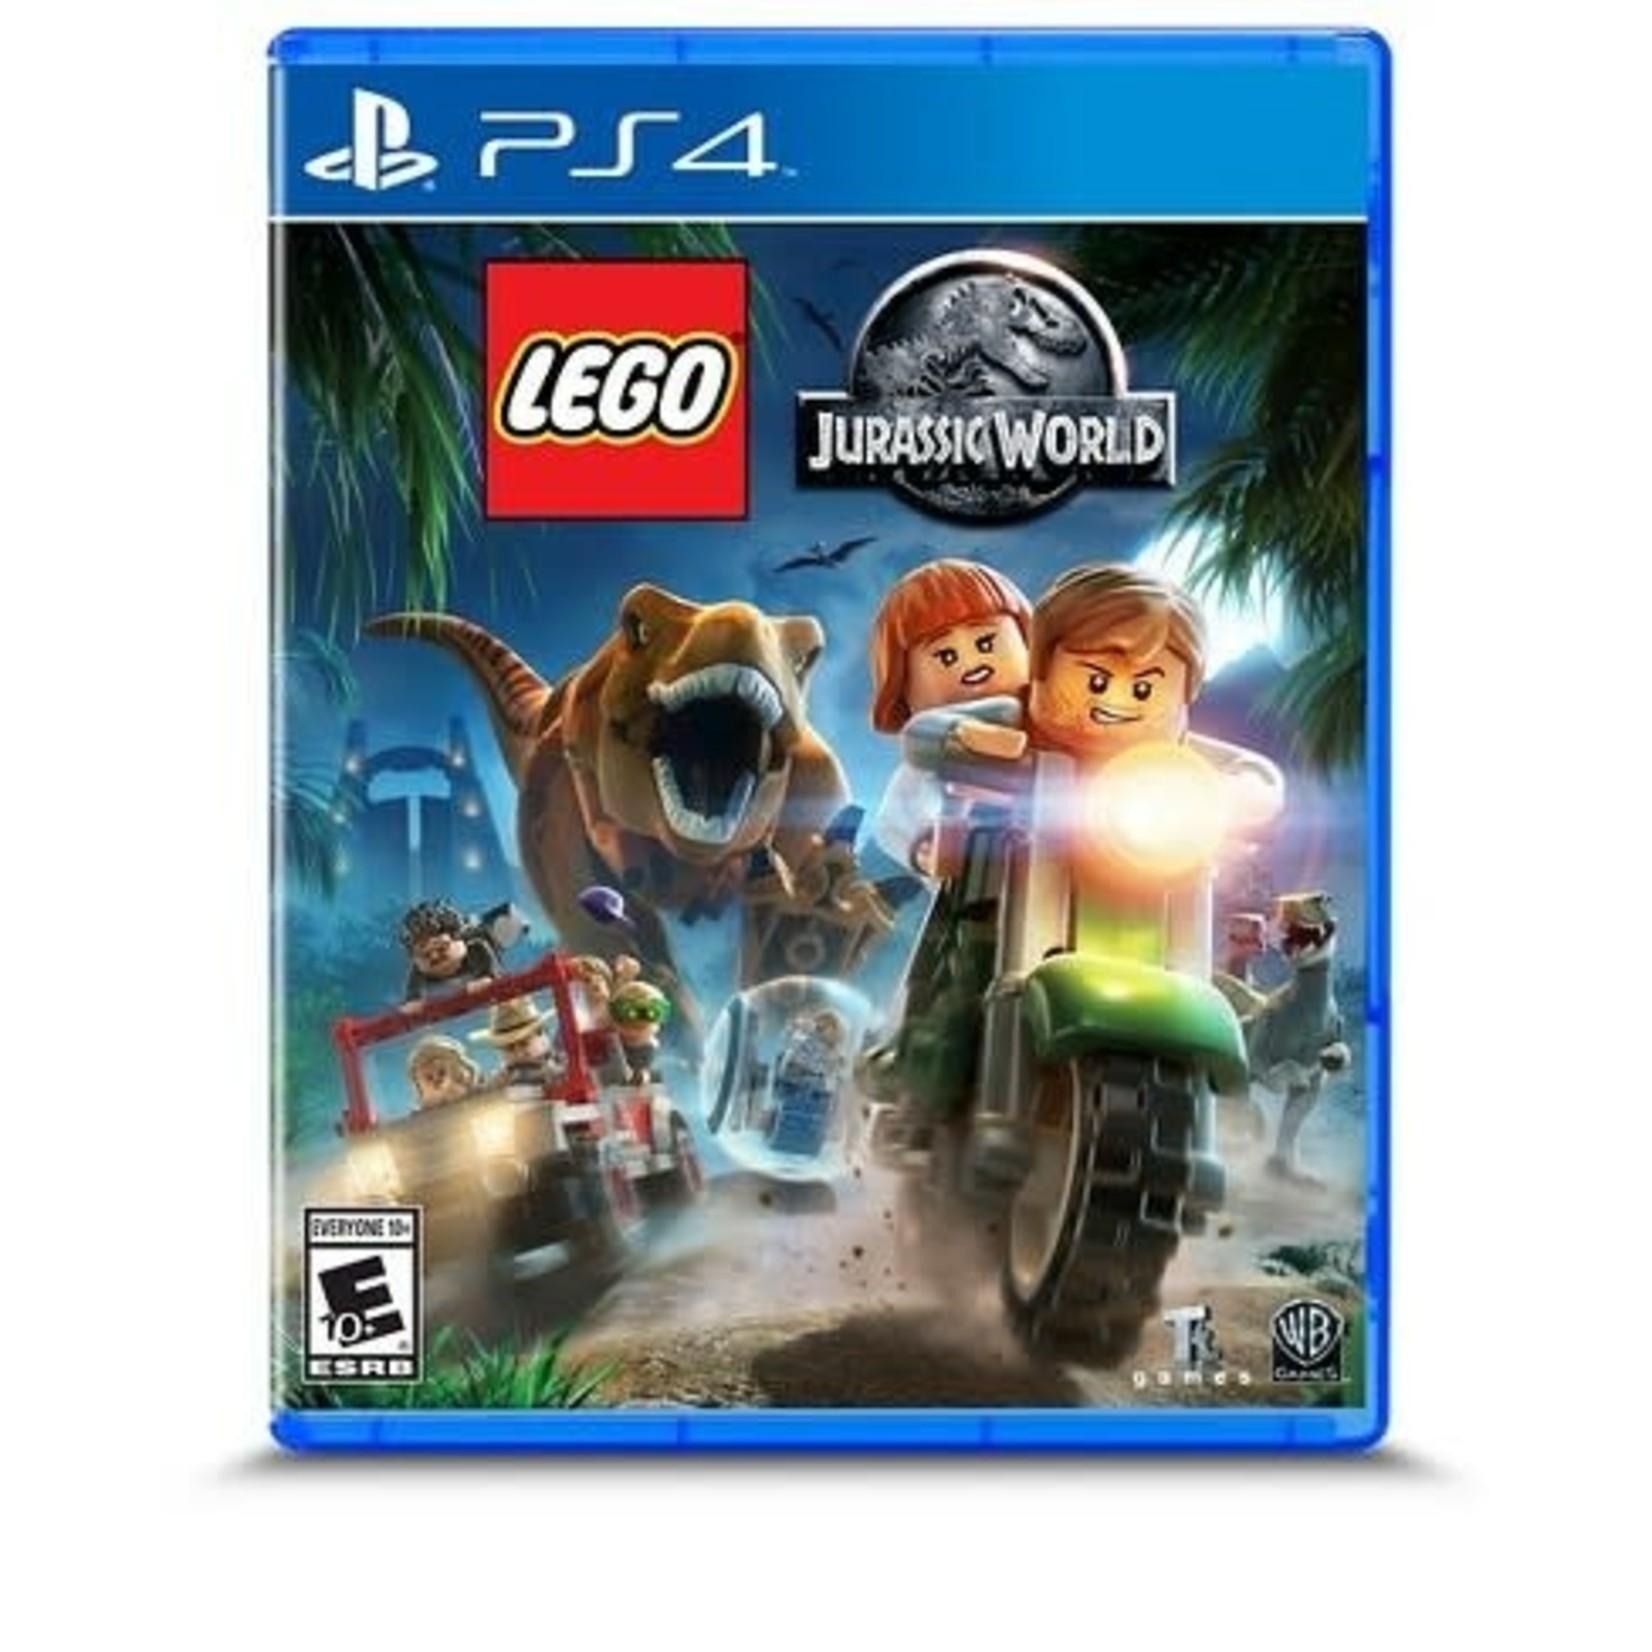 PS4-Lego Jurassic World